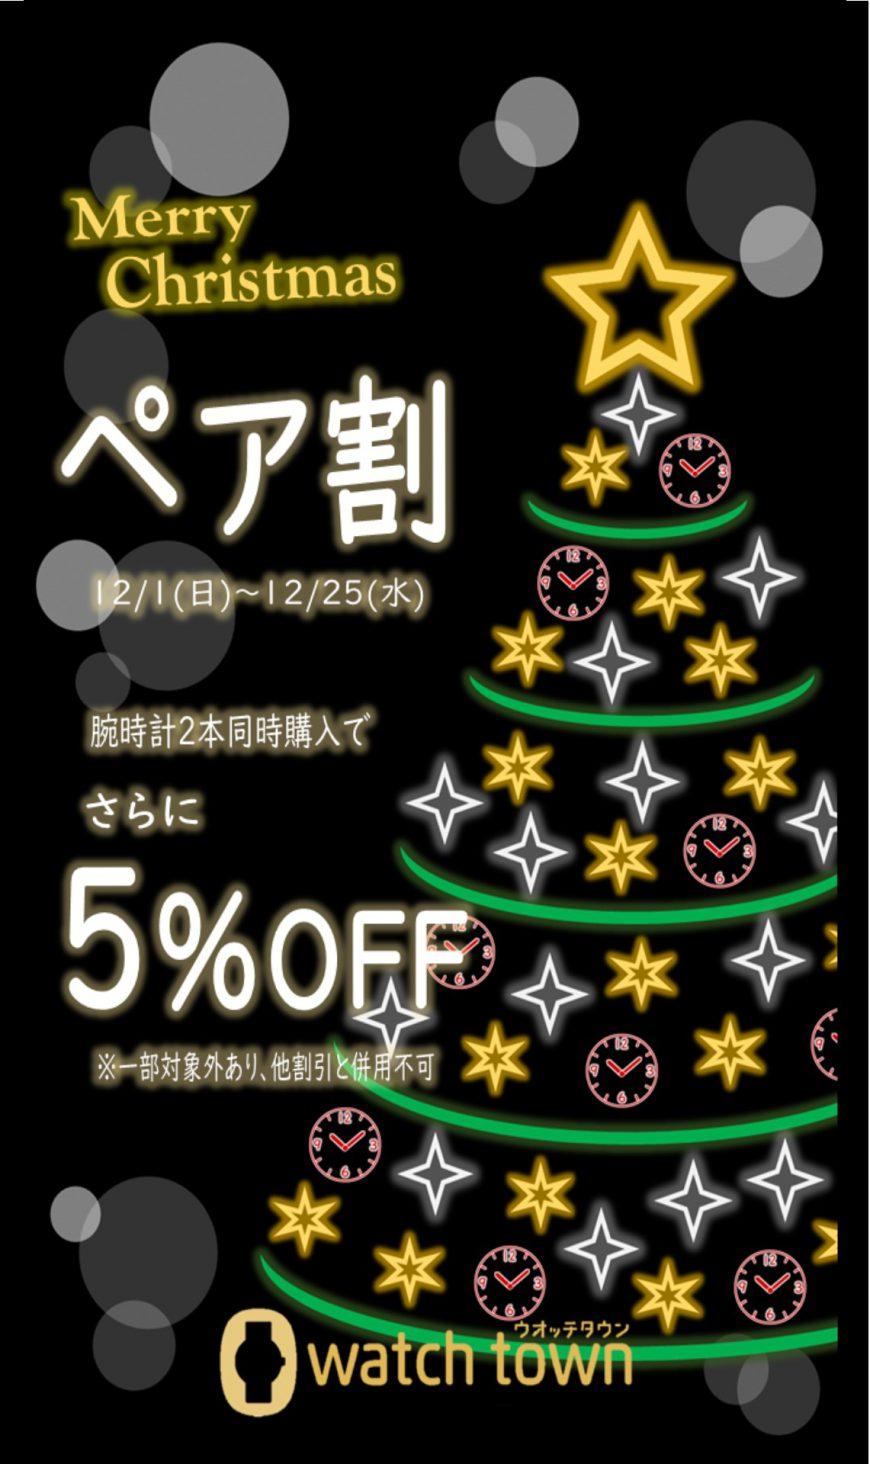 ~ Merry Christmas ~大切な人と同じ刻(とき)を刻んでください